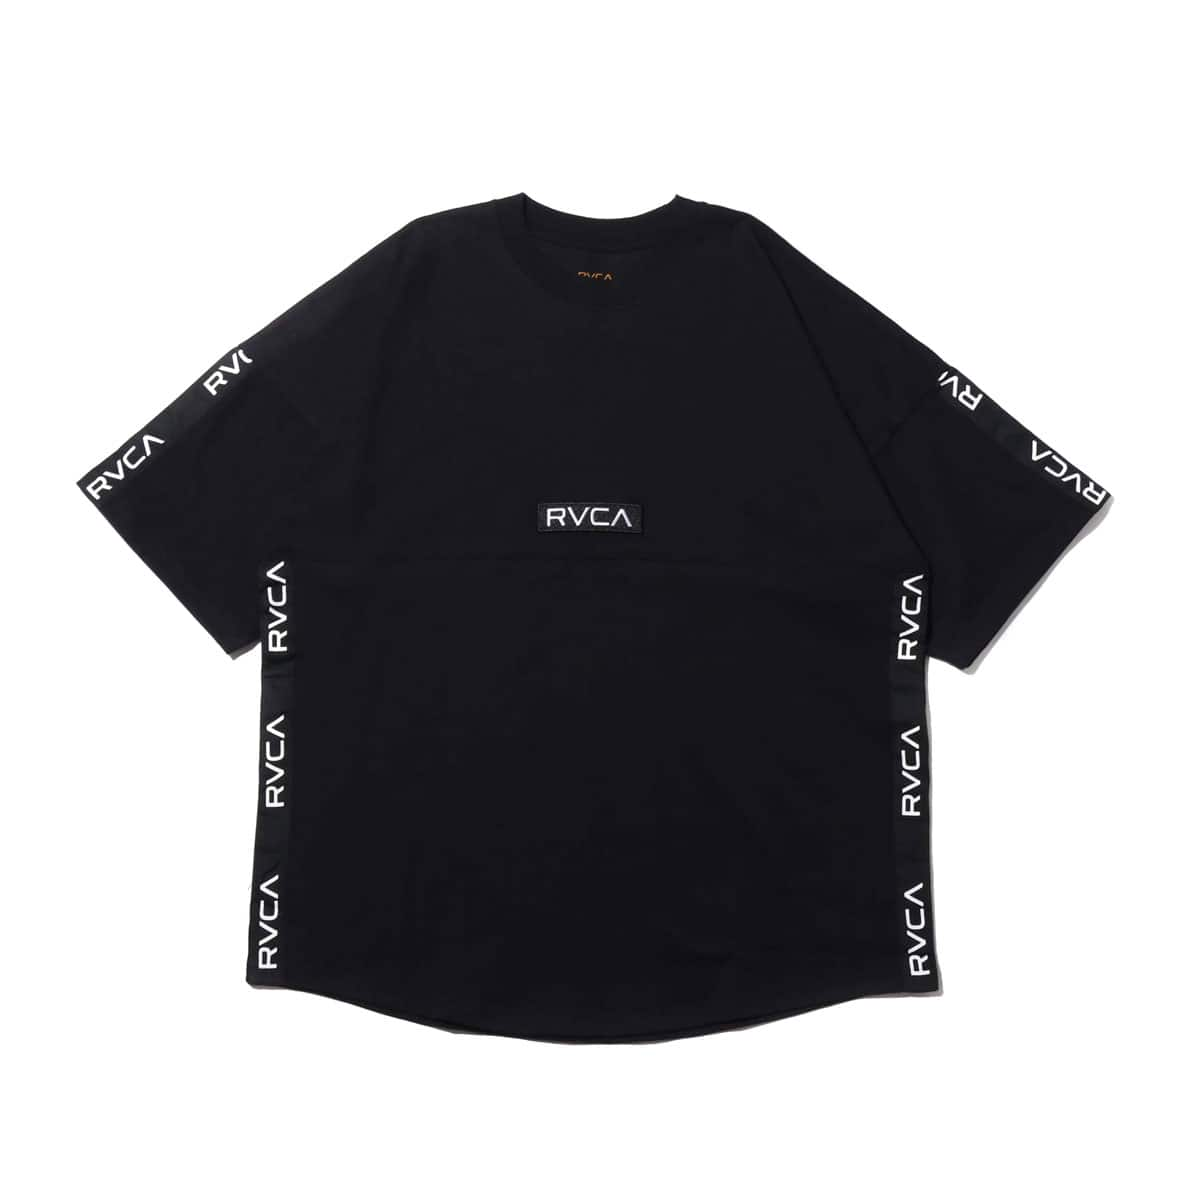 RVCA ARCH RVCA TAPE S/S BLACK 19FA-I_photo_large